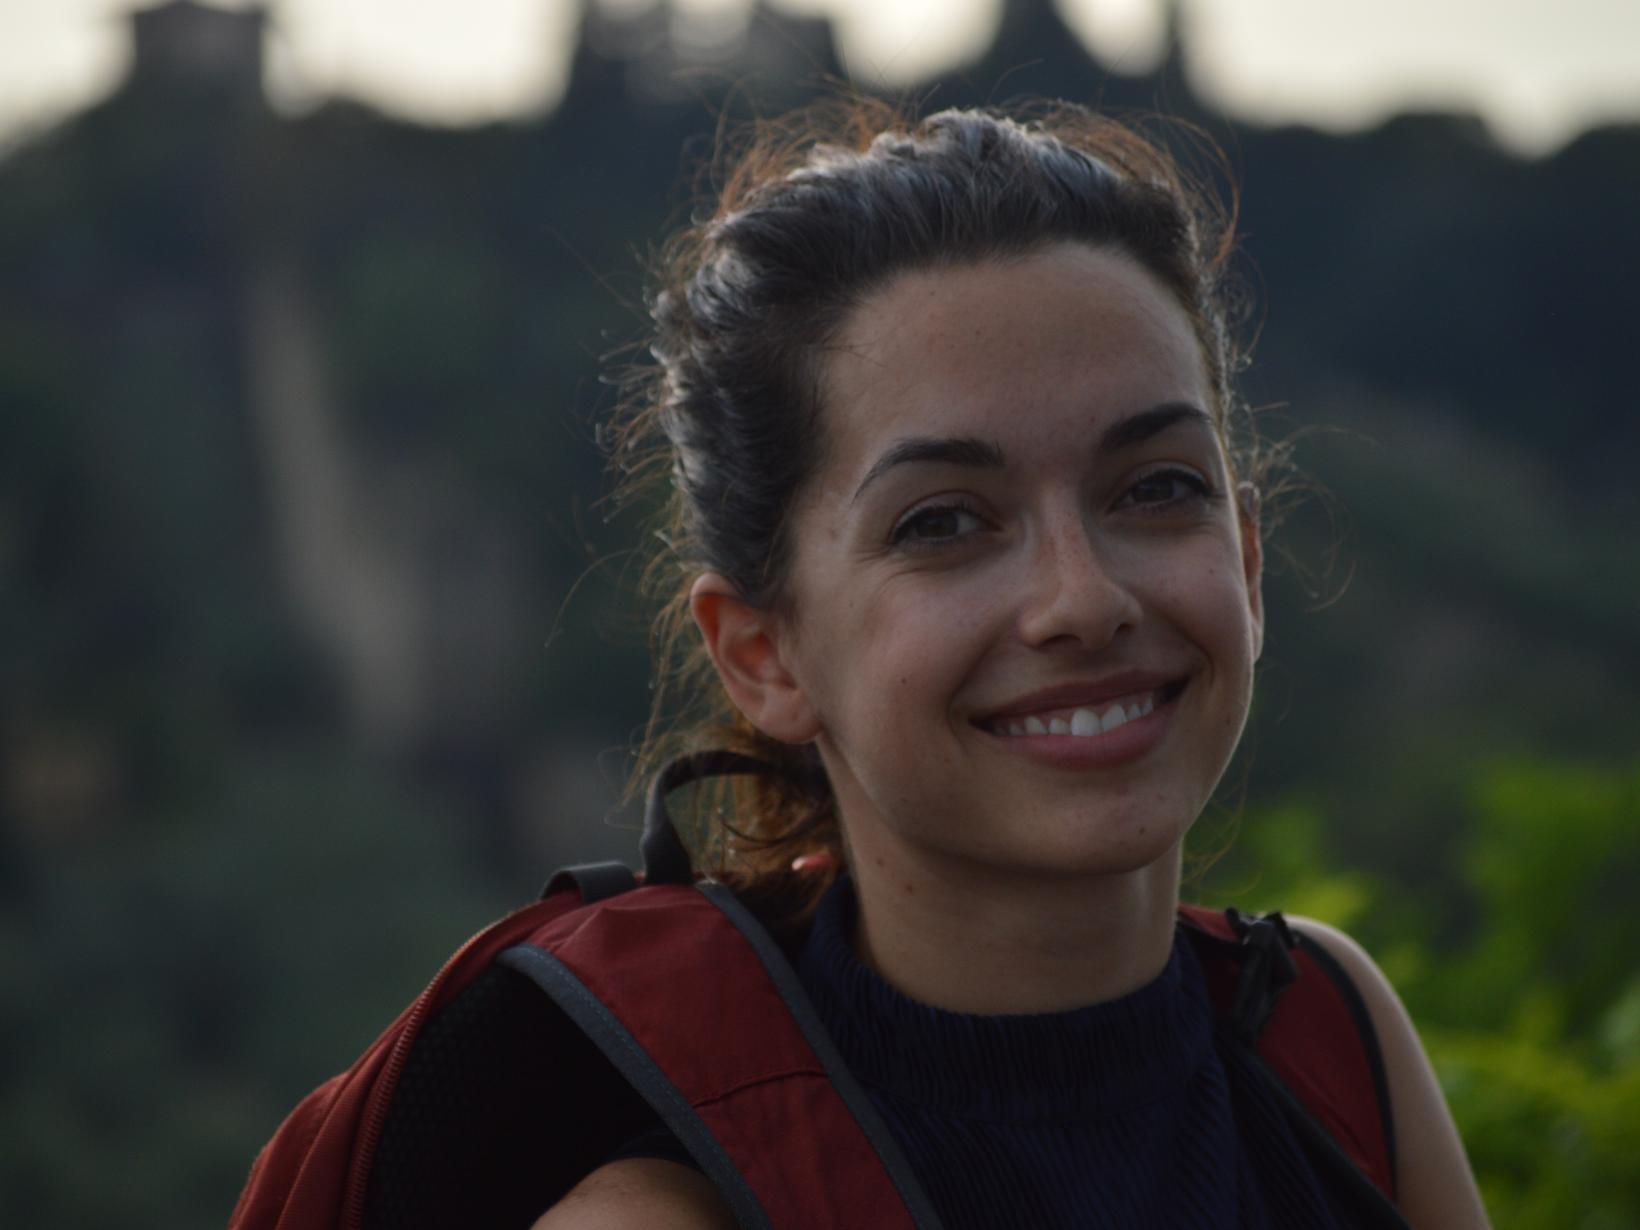 Hannah from Sydney, New South Wales, Australia